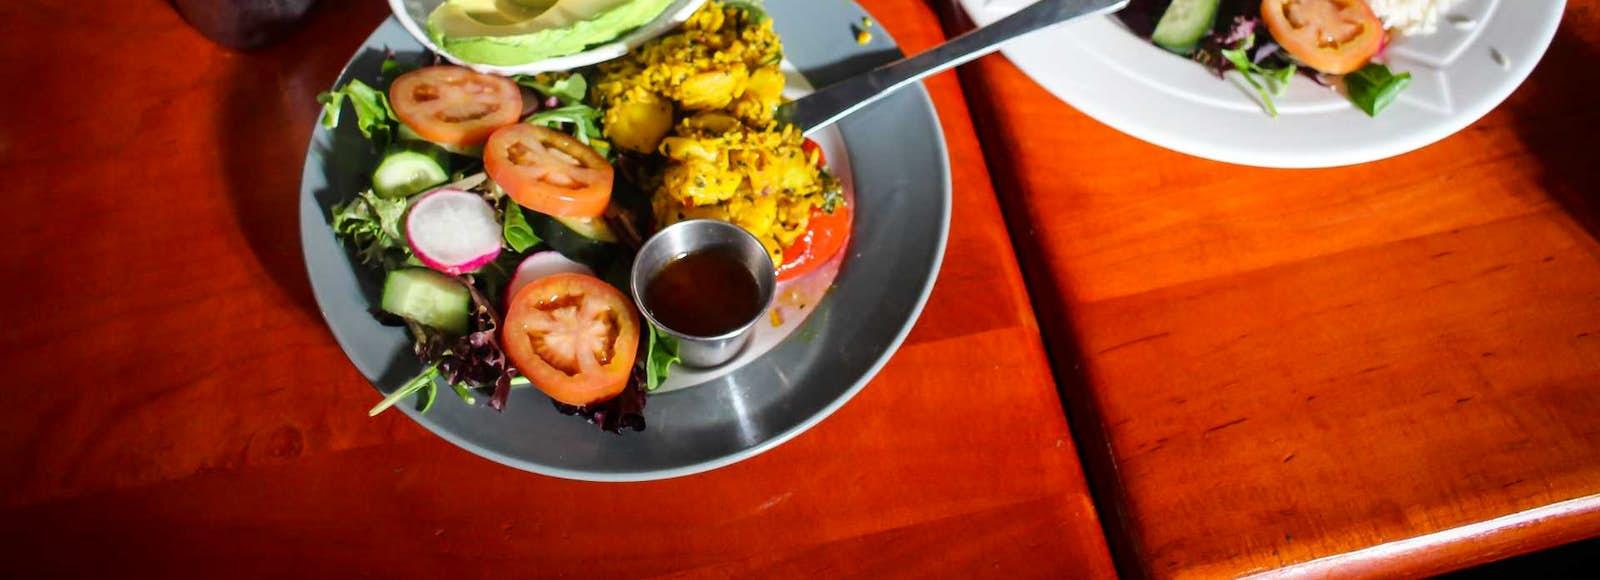 6 Tastiest Healthy Restaurants To Try In Dallas